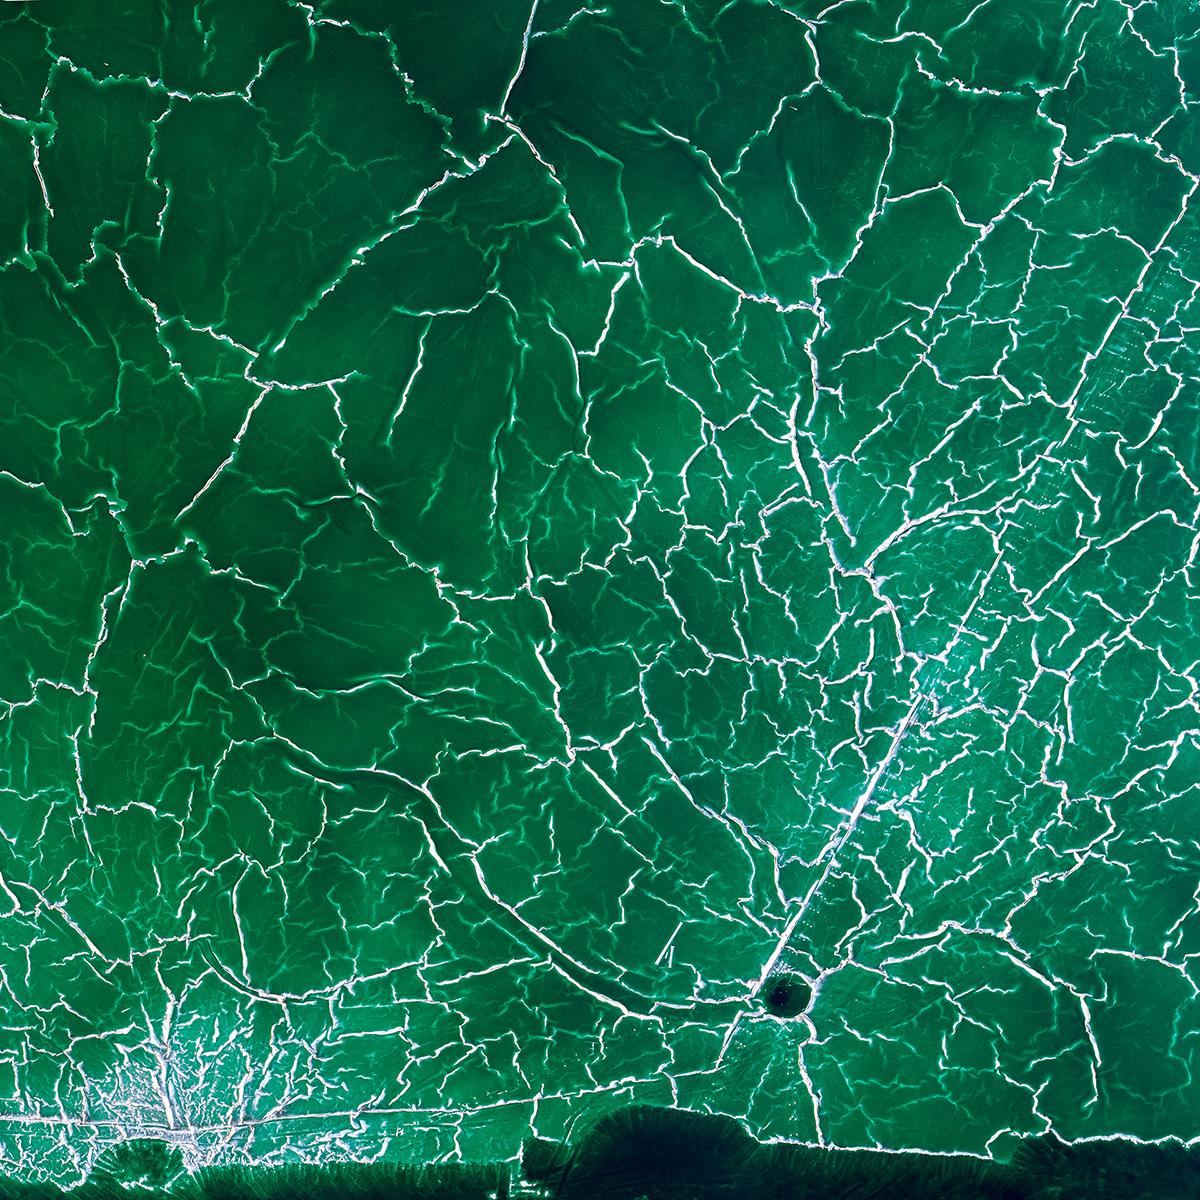 12-water-shape-earth-watershape.earth-milan-radisics-photography-fine-art-print-milan.hu_